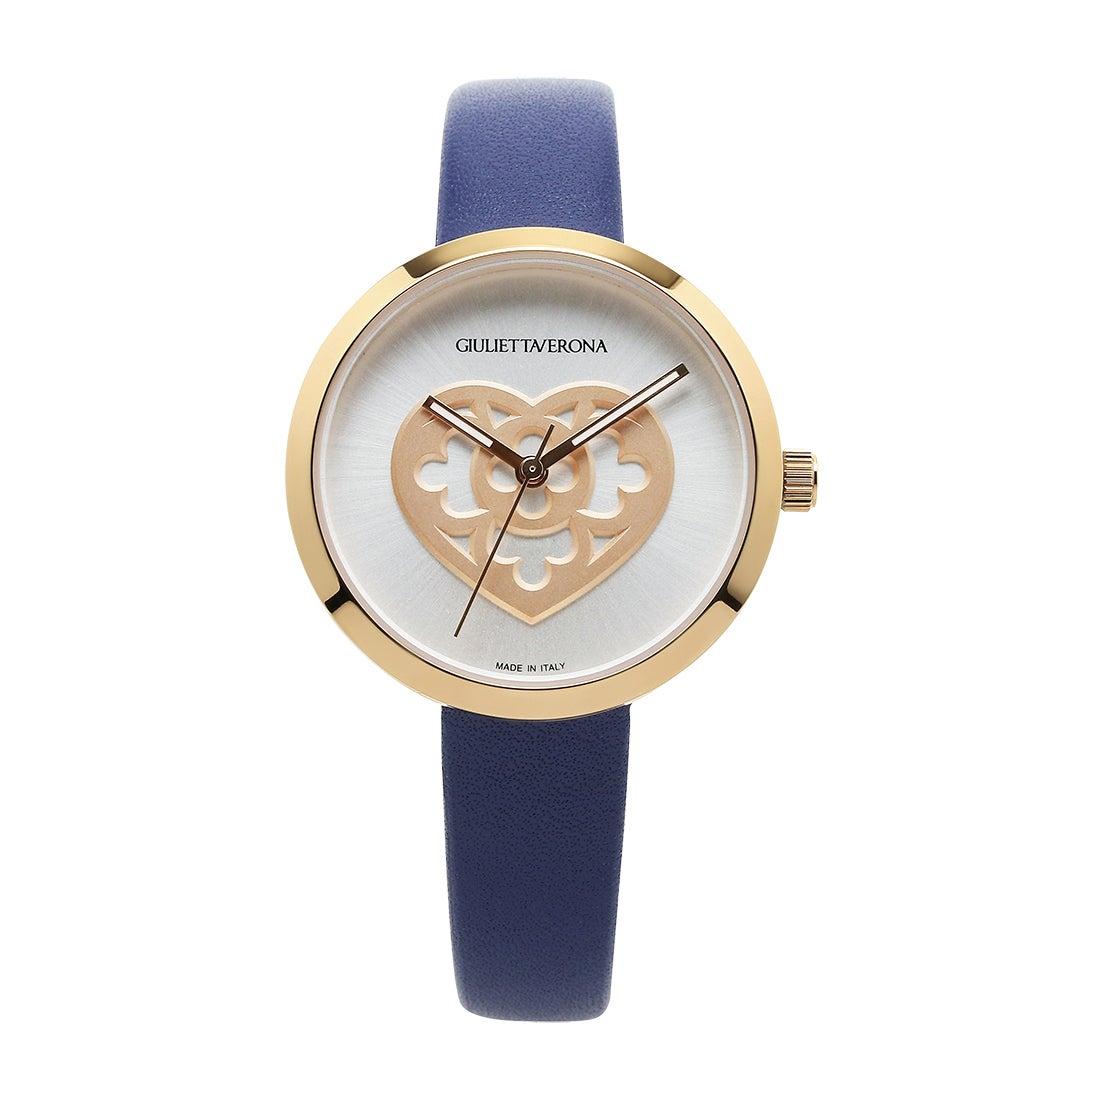 【SAC'S BAR】ジュリエッタヴェローナ GIULIETTAVERONA 腕時計 GV001 LOVE MEMORY シルバー×ネイビー